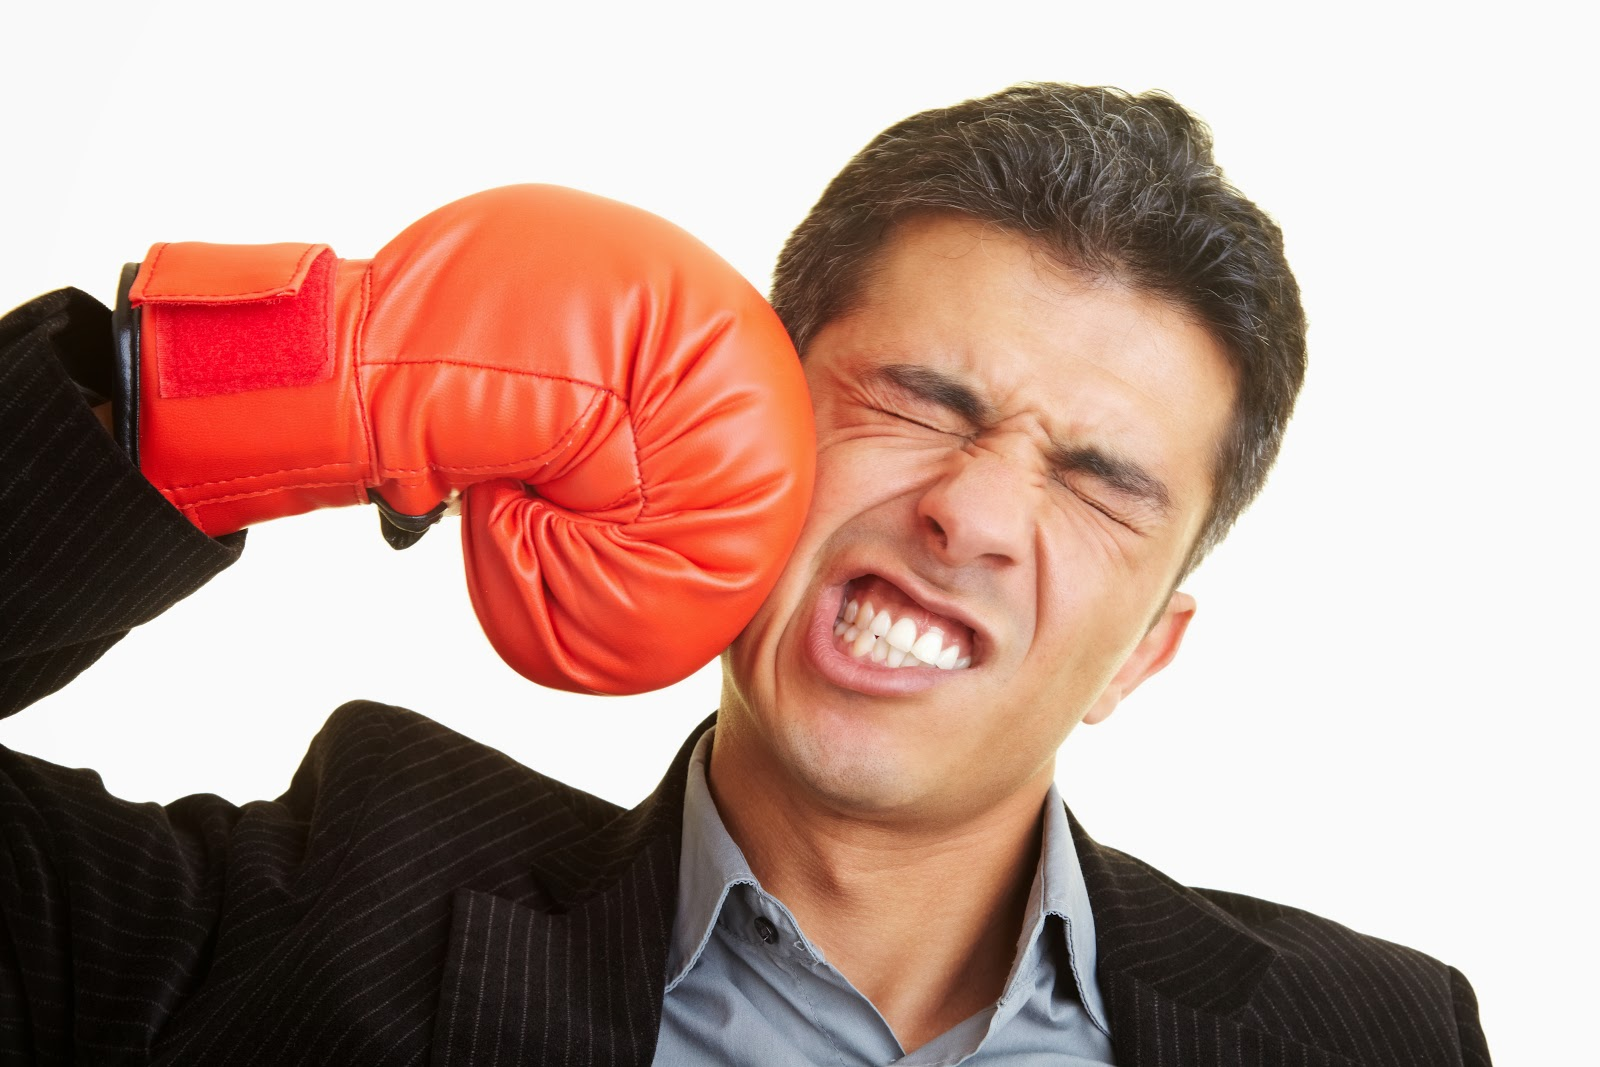 Photo Of Man Punching Himself